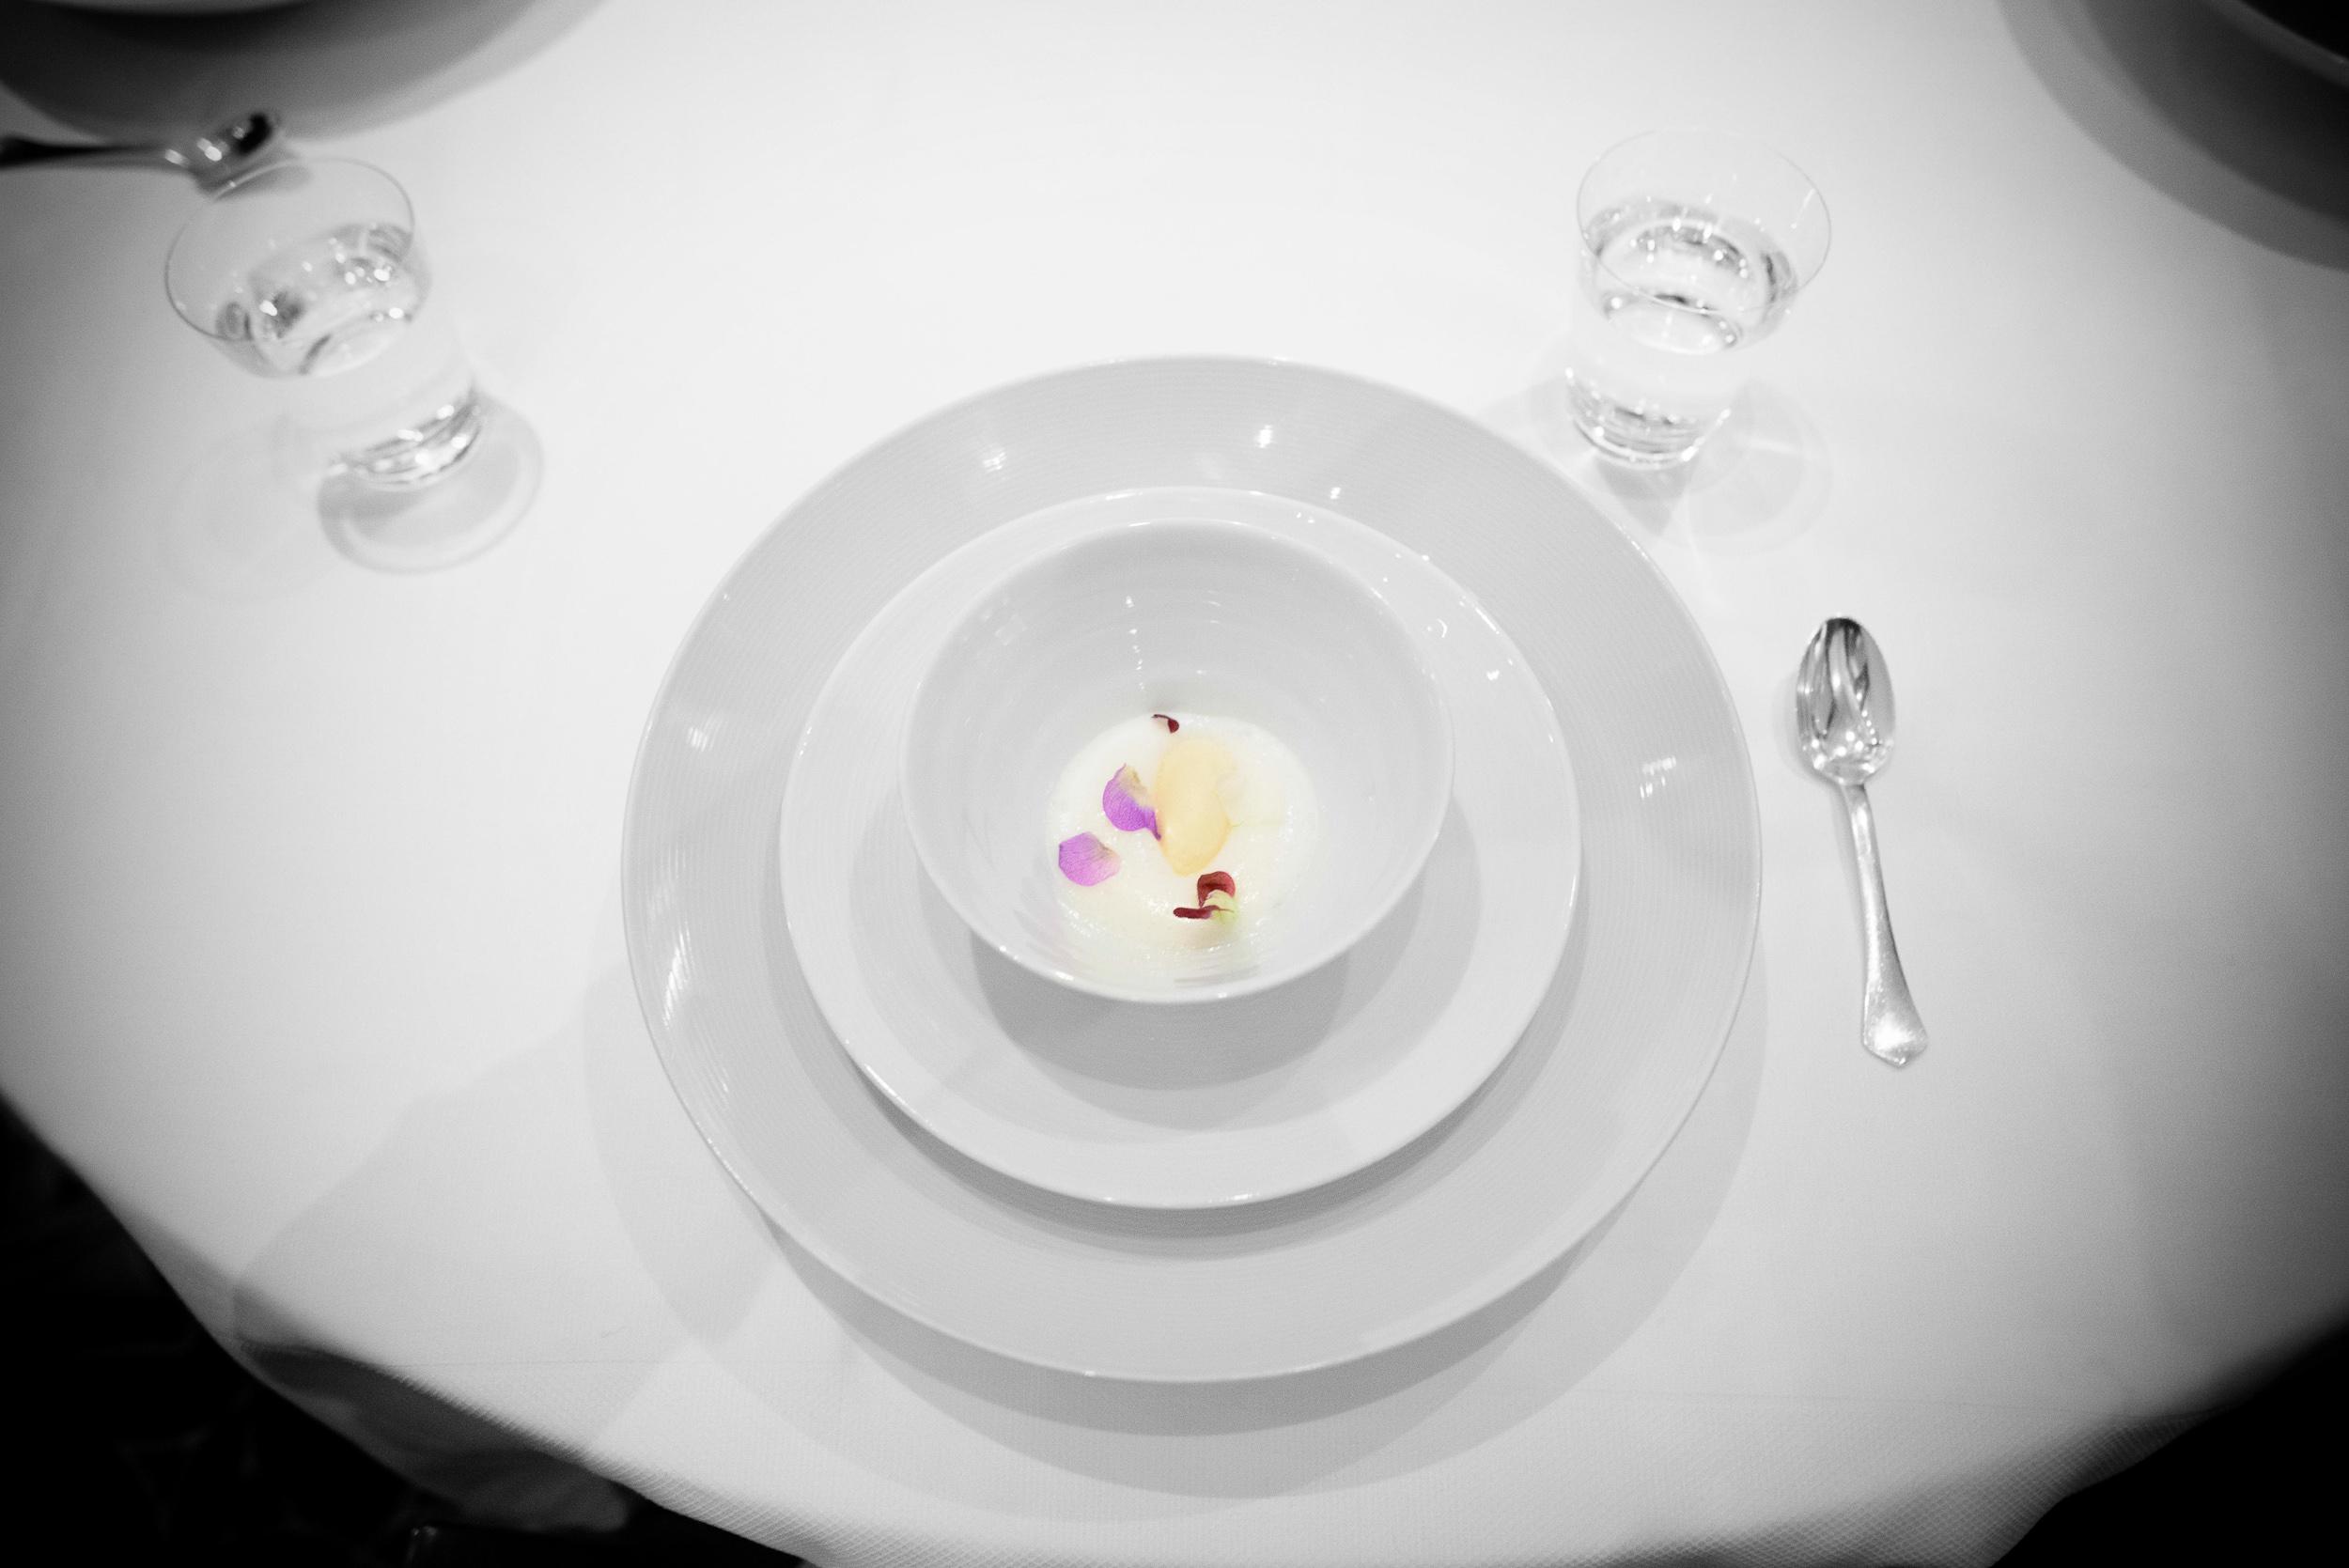 4th Course: Shiro miso sorbet, green strawberries, English peas,